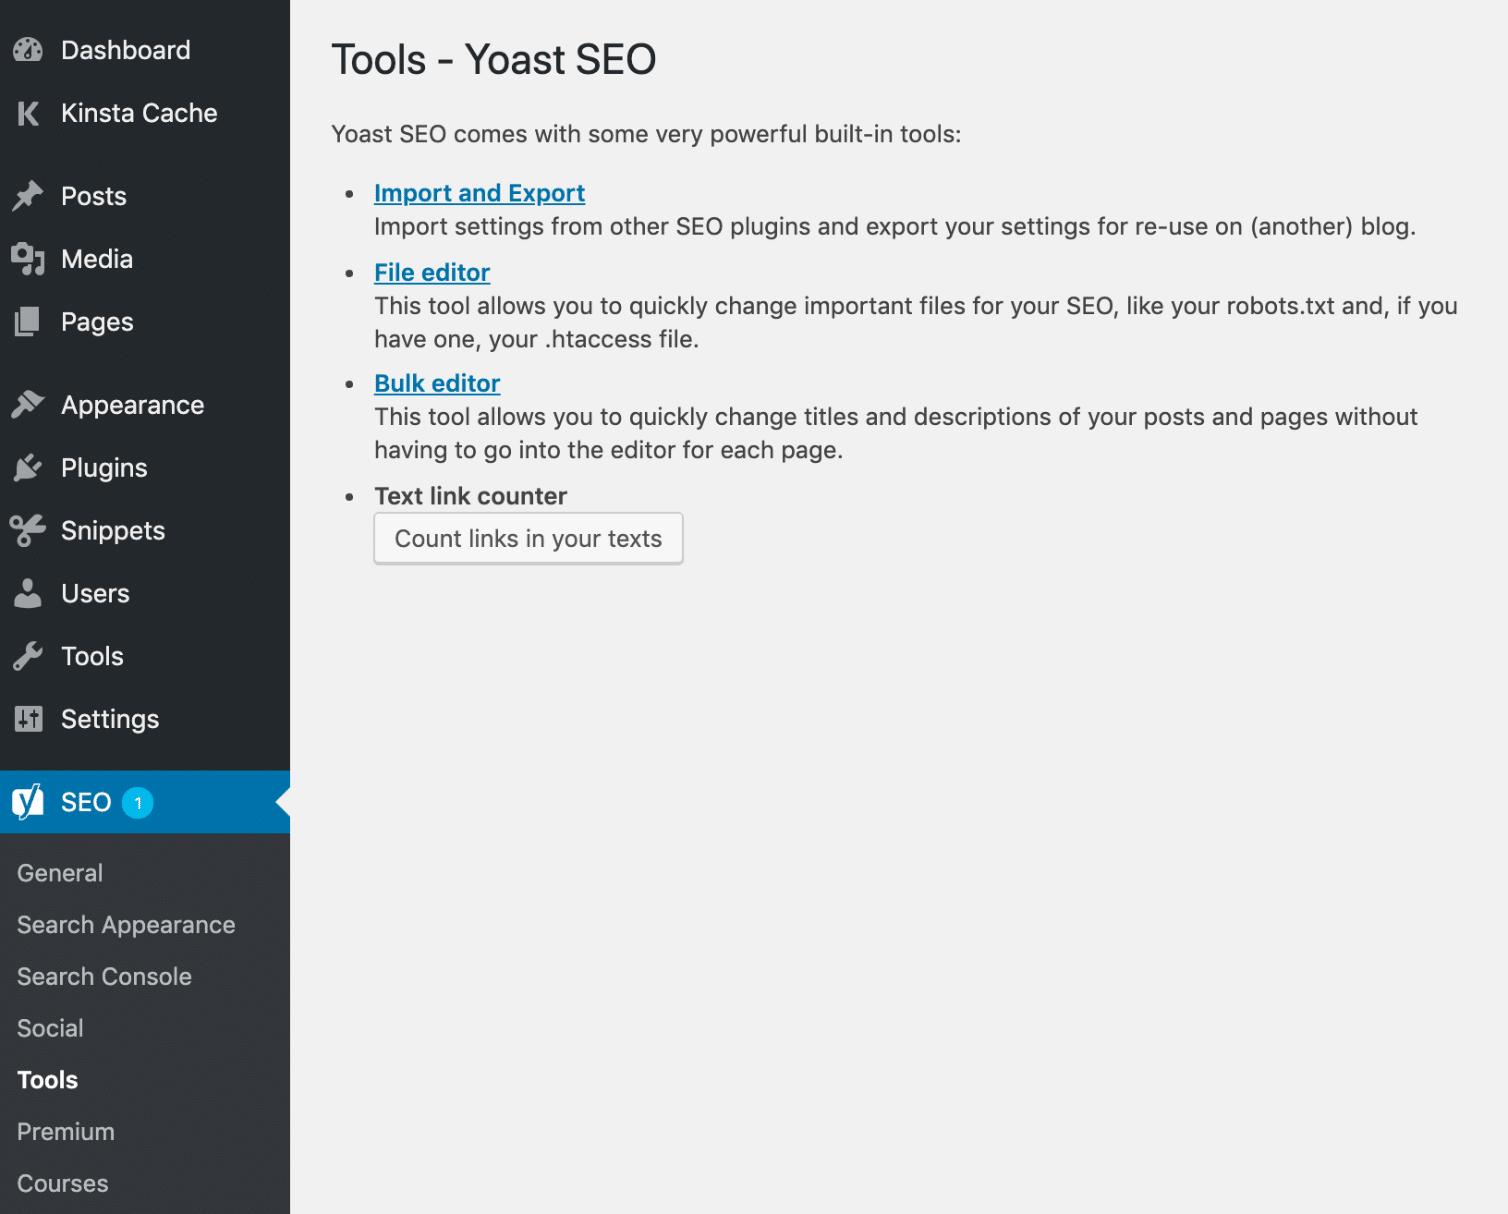 Liste der Yoast SEO Tools